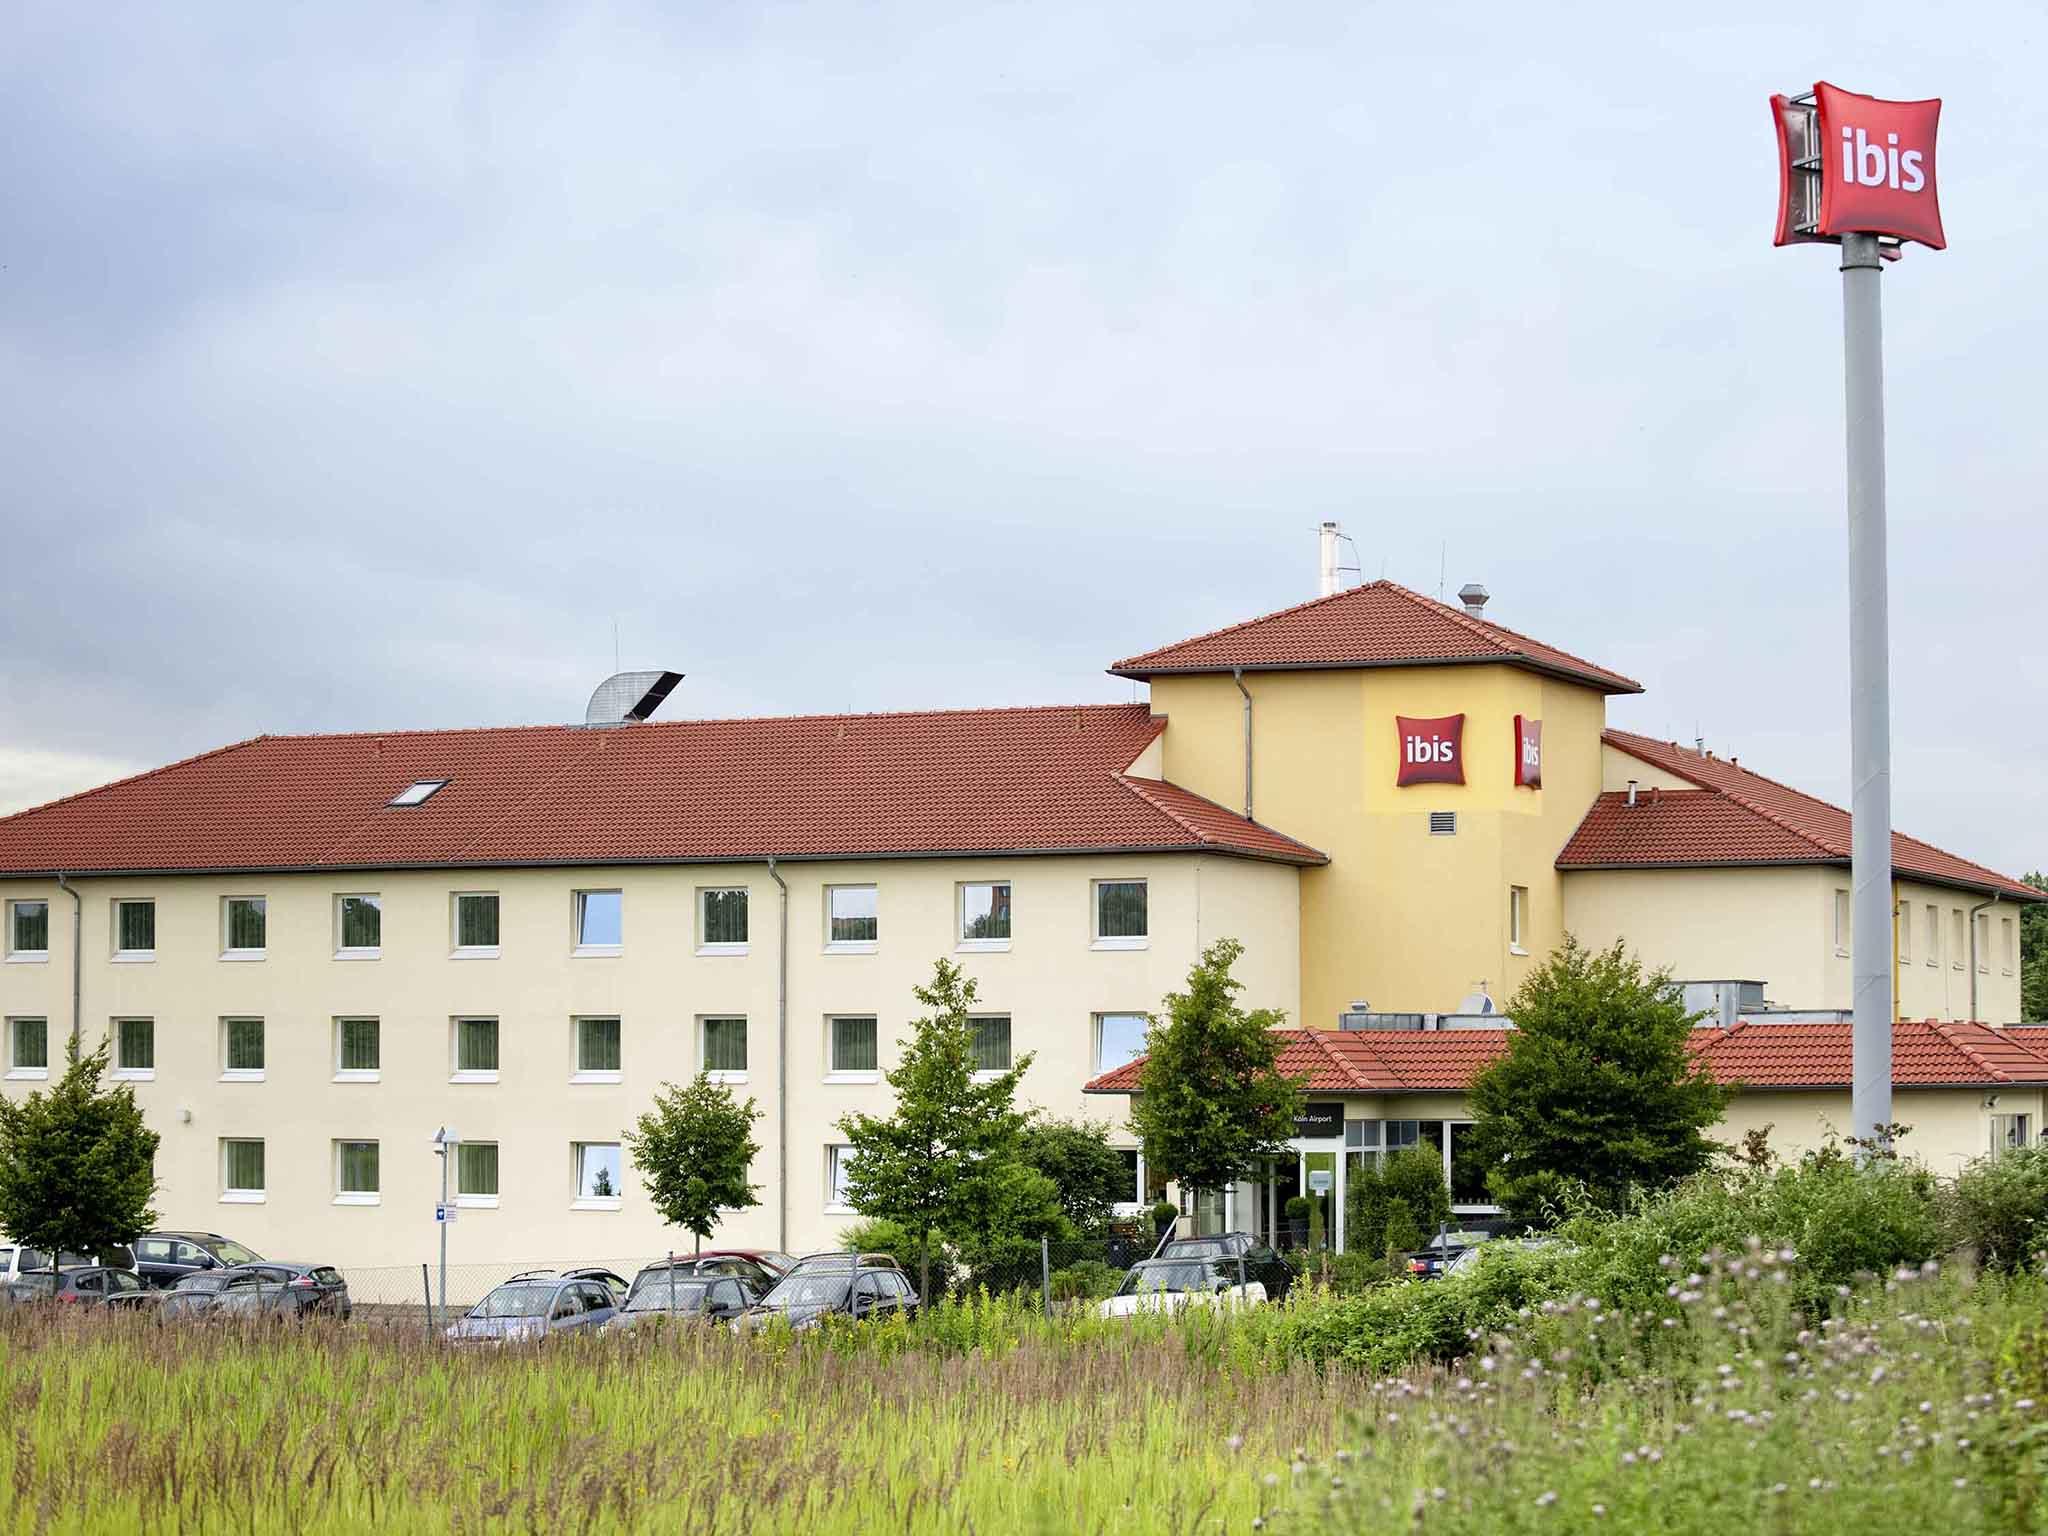 Hotel - ibis Koeln Airport